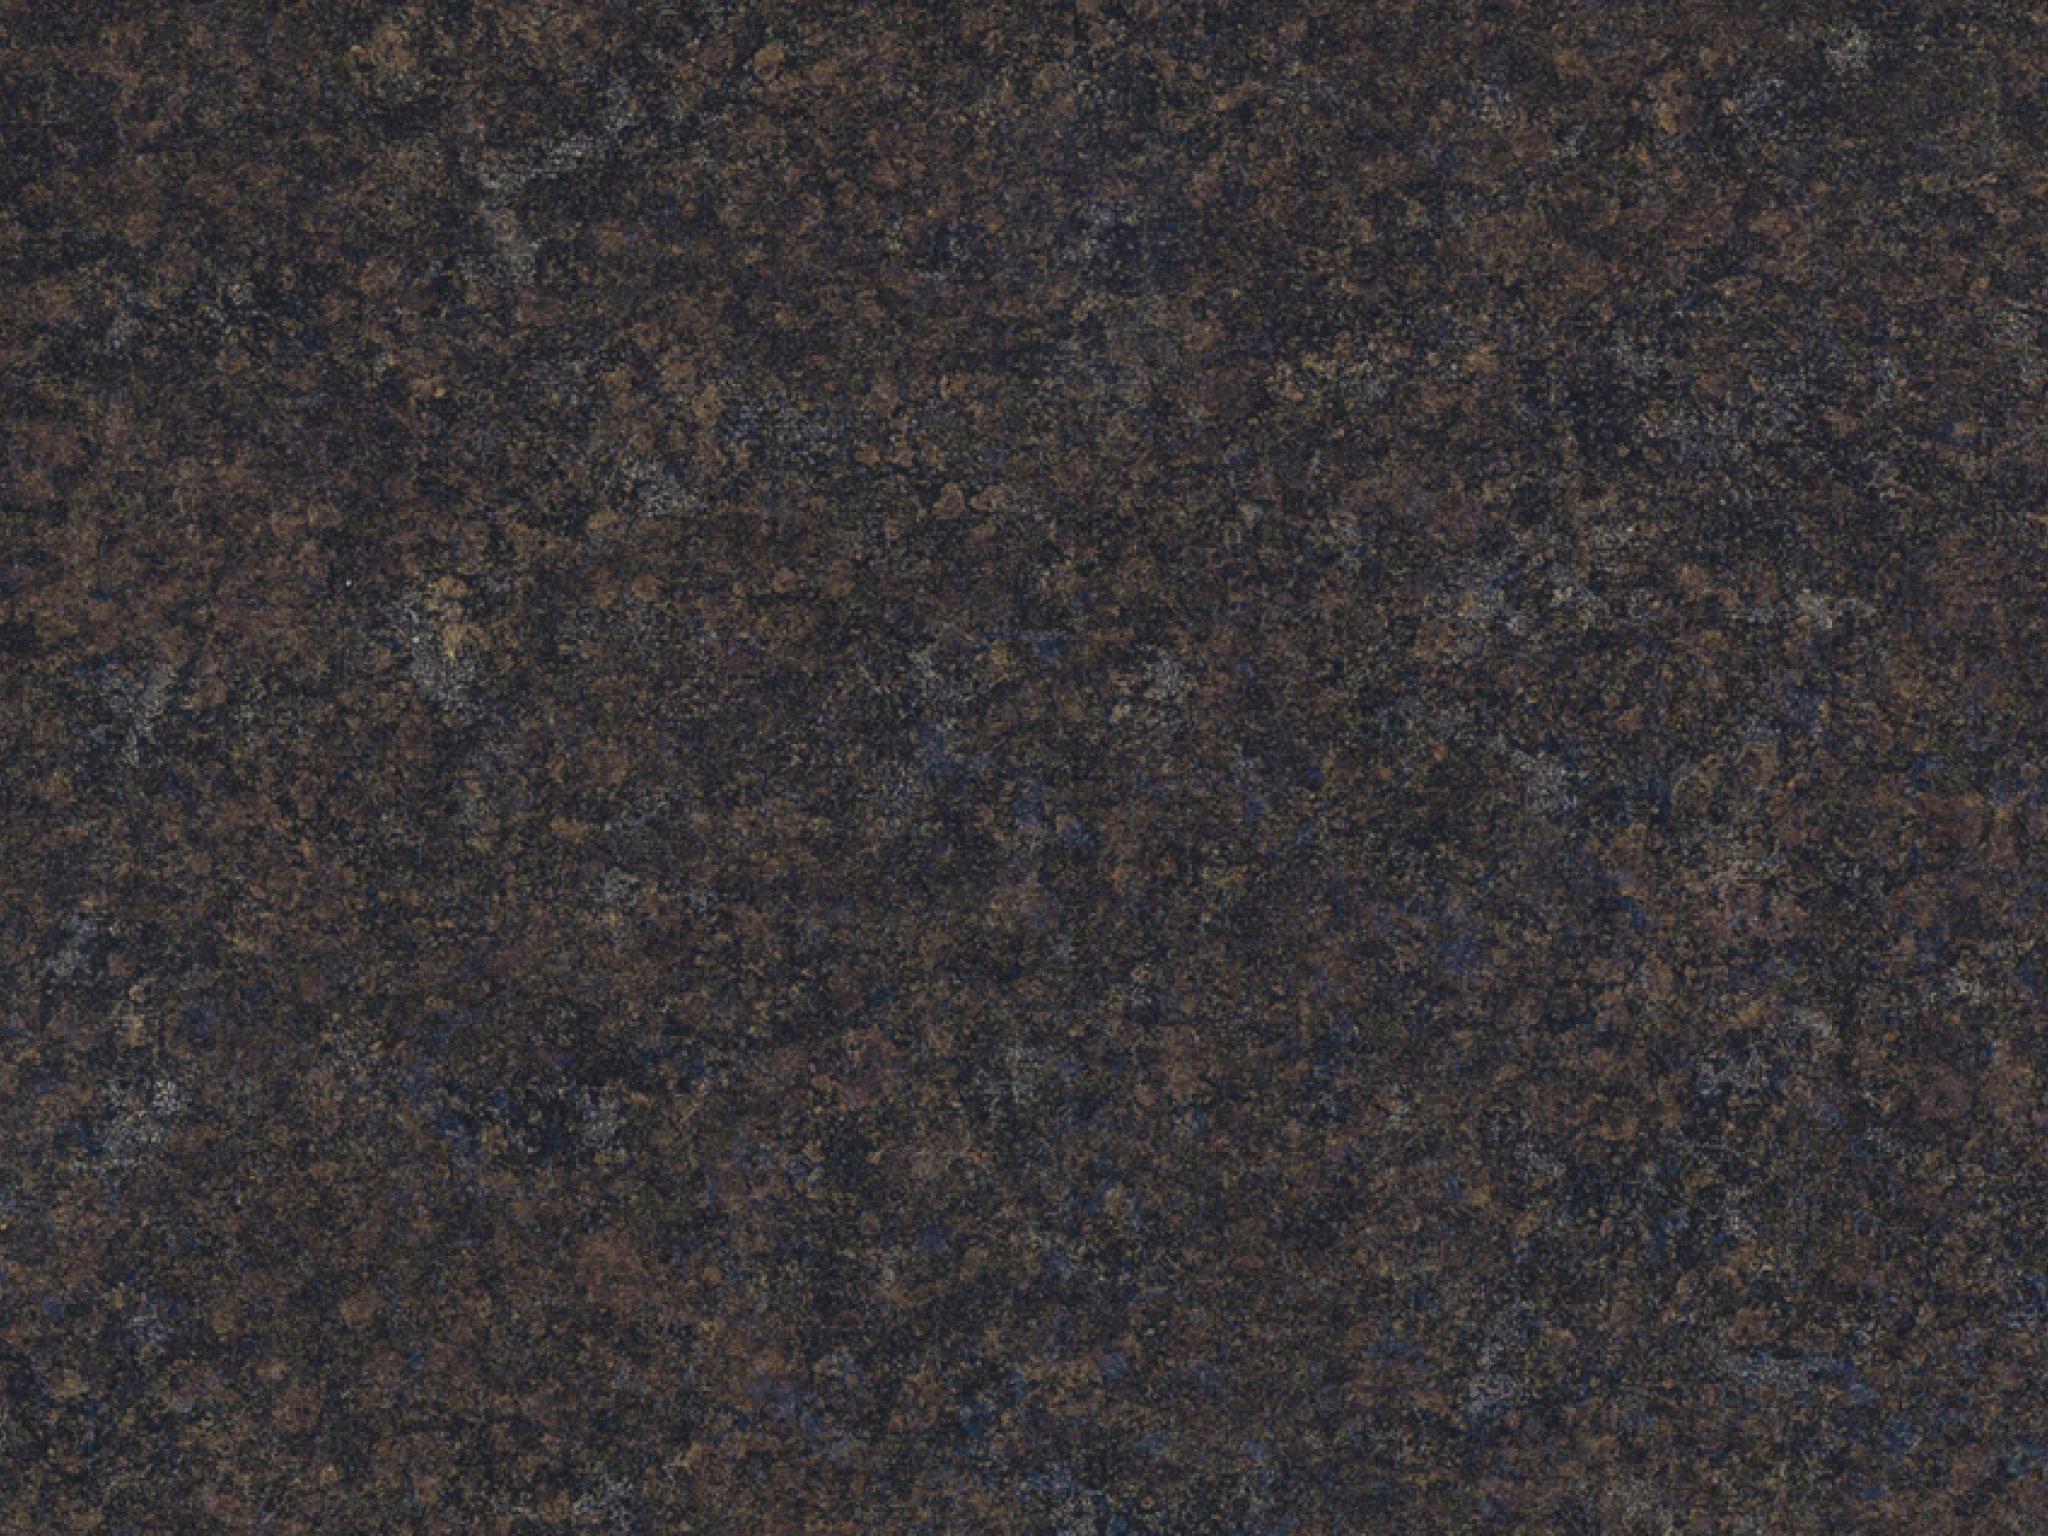 MAY_Decor_Countertops-MineralJet